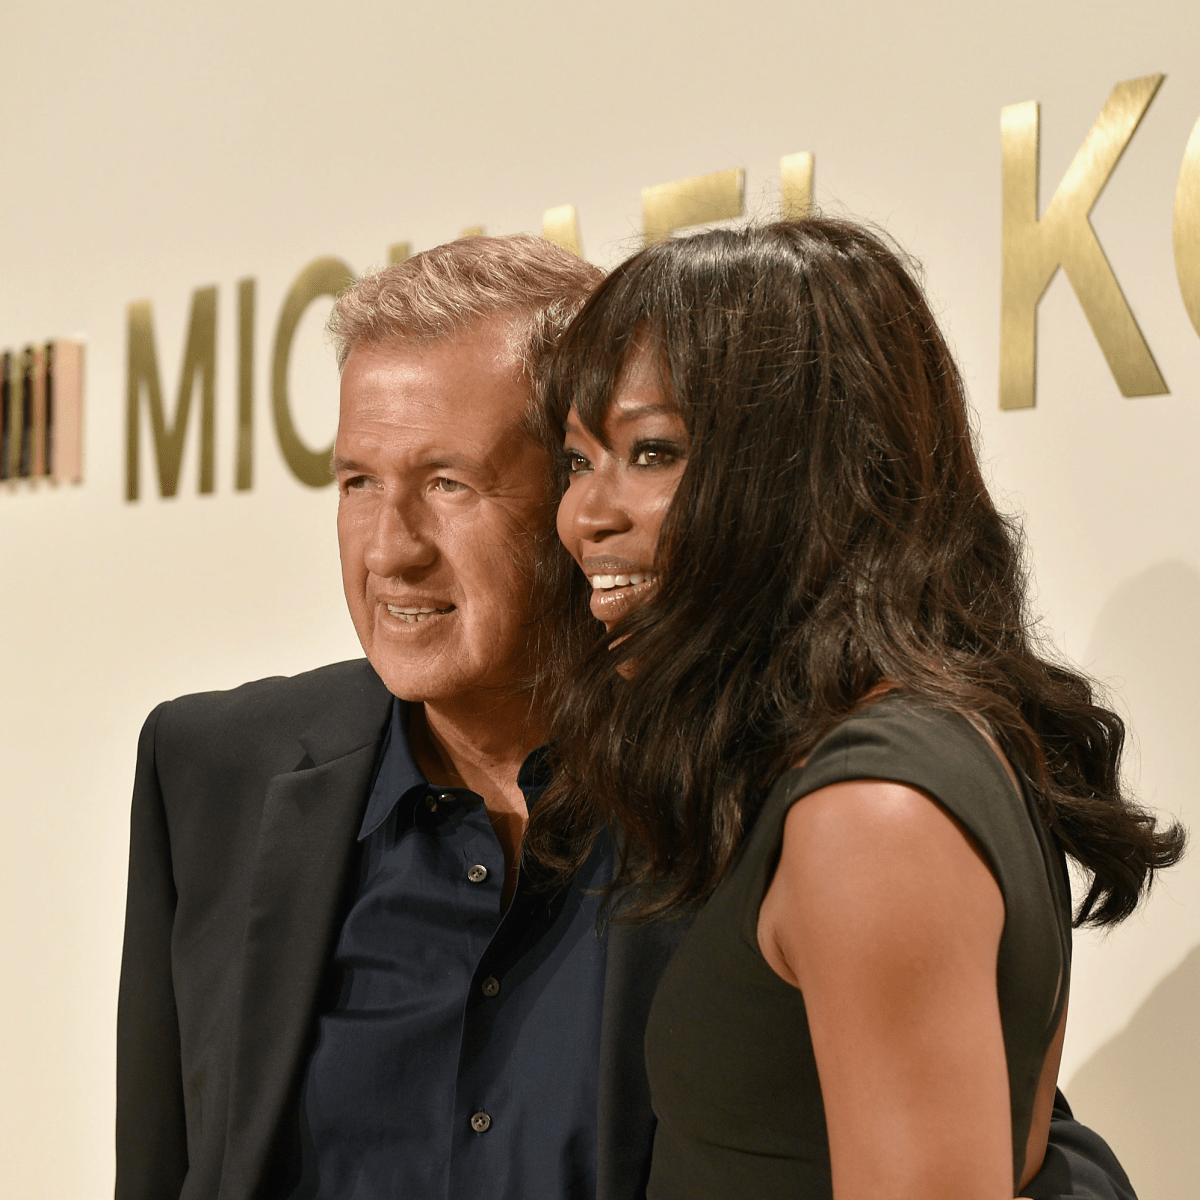 Naomi Campbell and Mario Testino at Michael Kors Gold fragrance launch